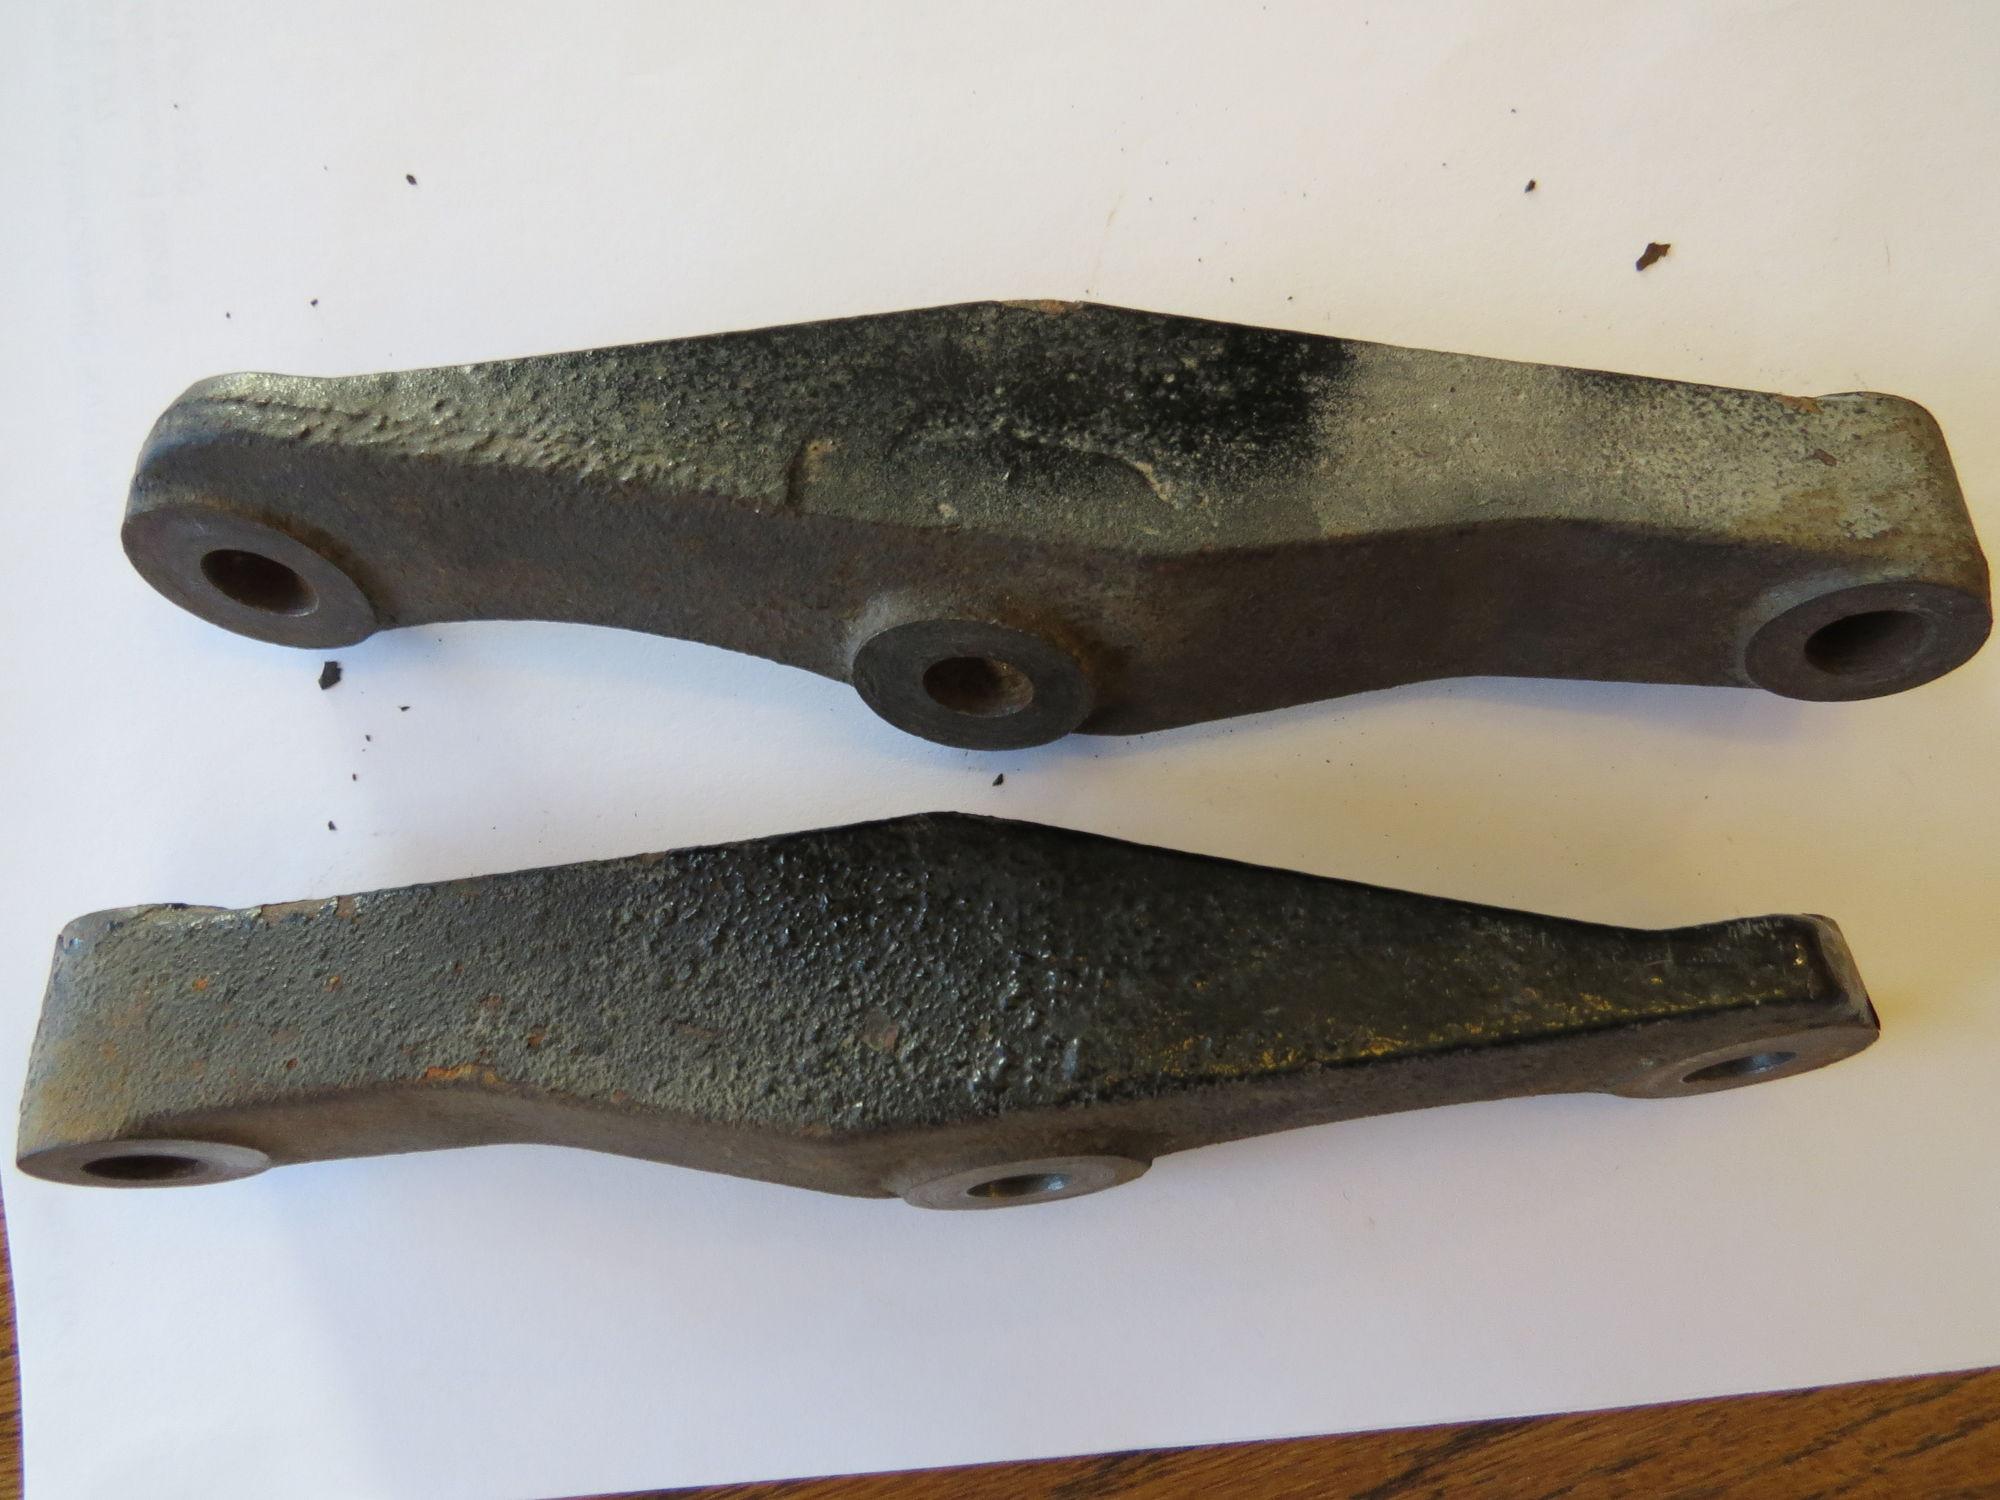 Fs For Sale 65 67 J56 Brakes Front Caliper Brackets